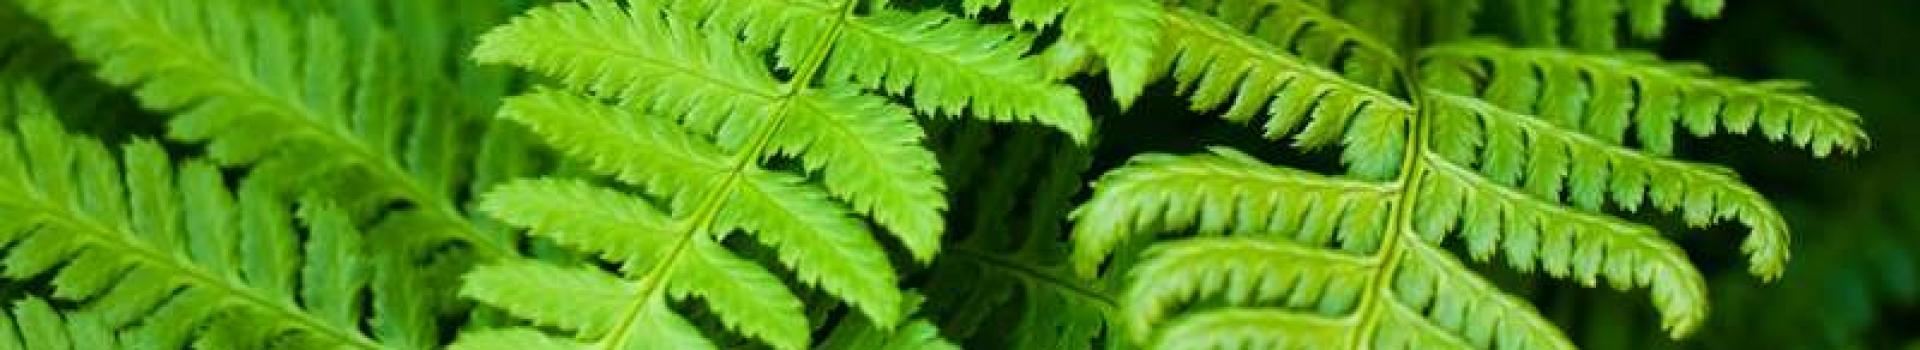 گیاه سرخس